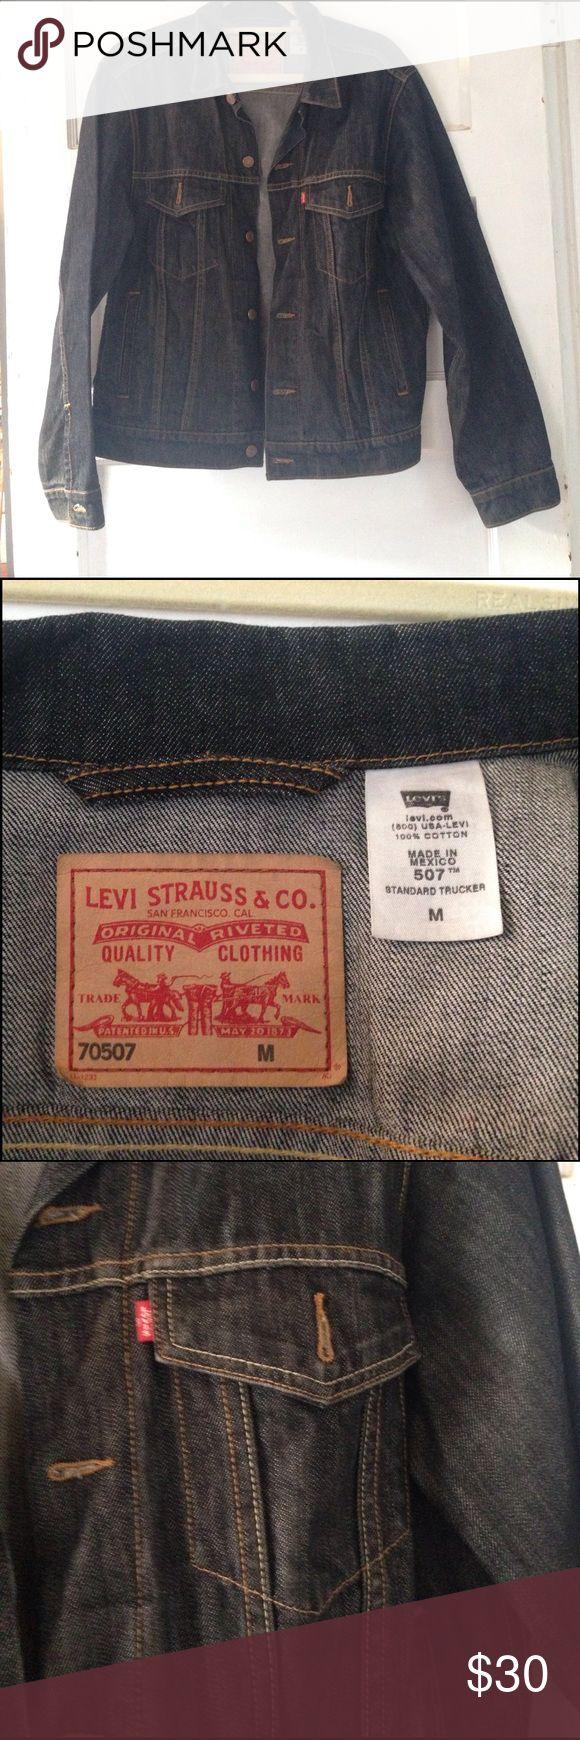 Levi Standard Trucker Denim Jacket Levi 507 jean jacket. Dark gray, almost black. Size Medium. Great condition. Still pretty crisp. Levi's Jackets & Coats Lightweight & Shirt Jackets